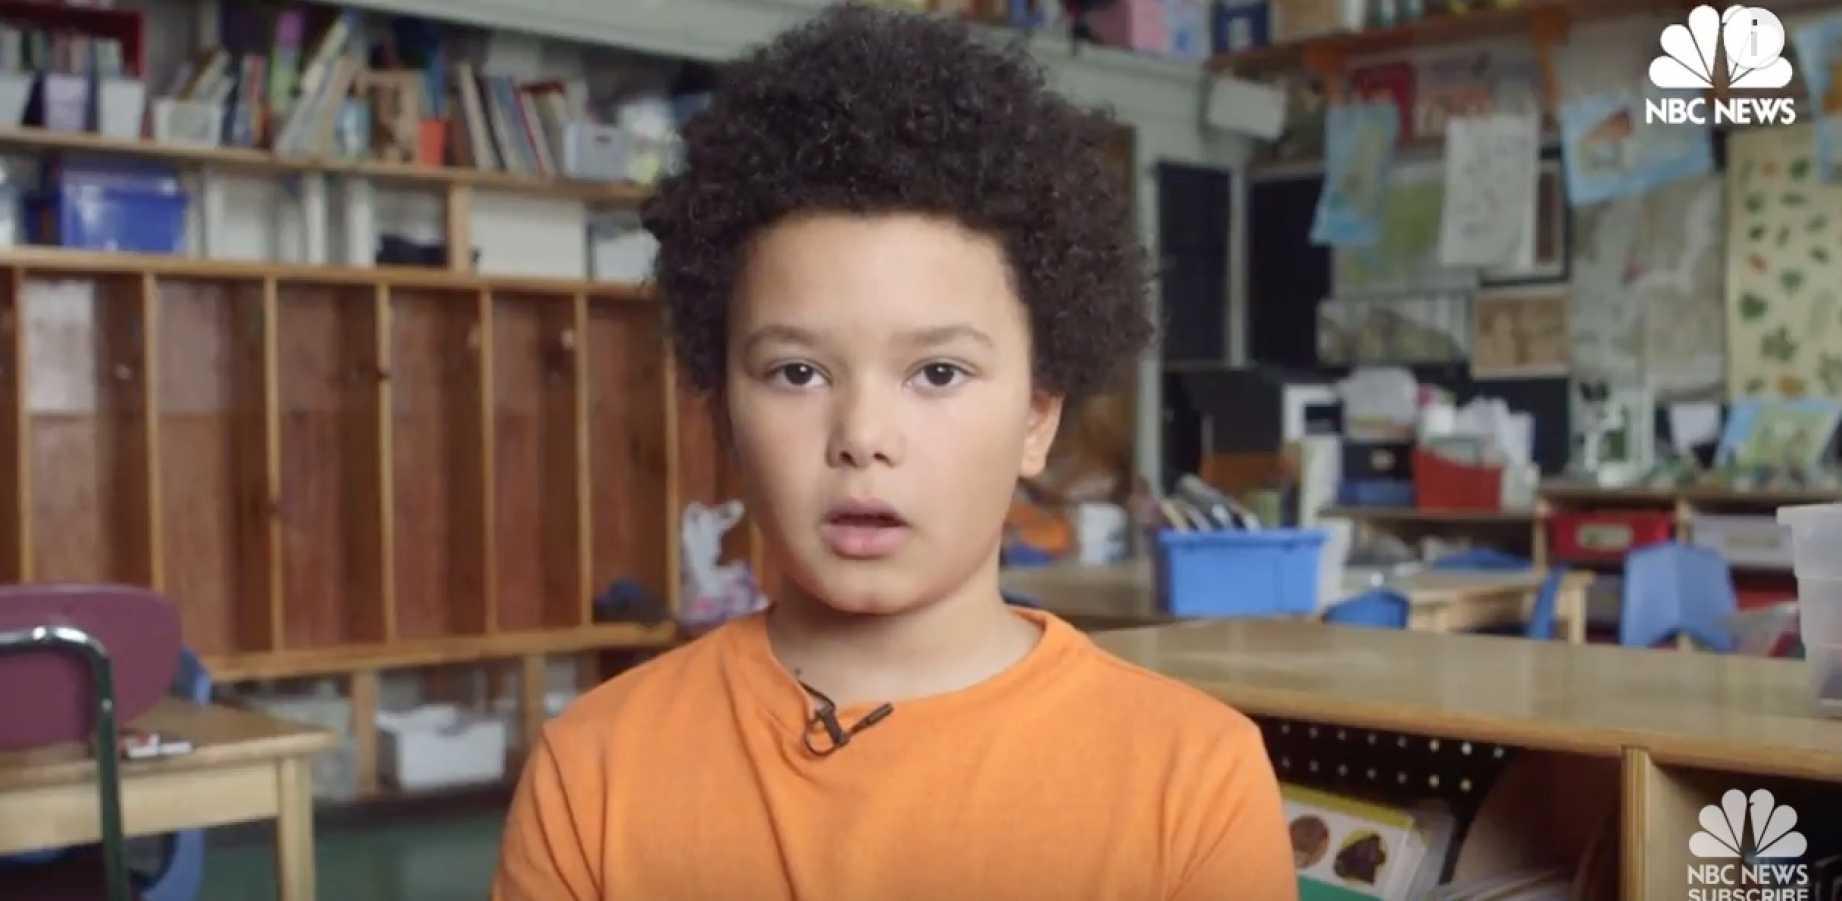 NBC Releases Two Propaganda Videos Featuring Children Attacking Trump